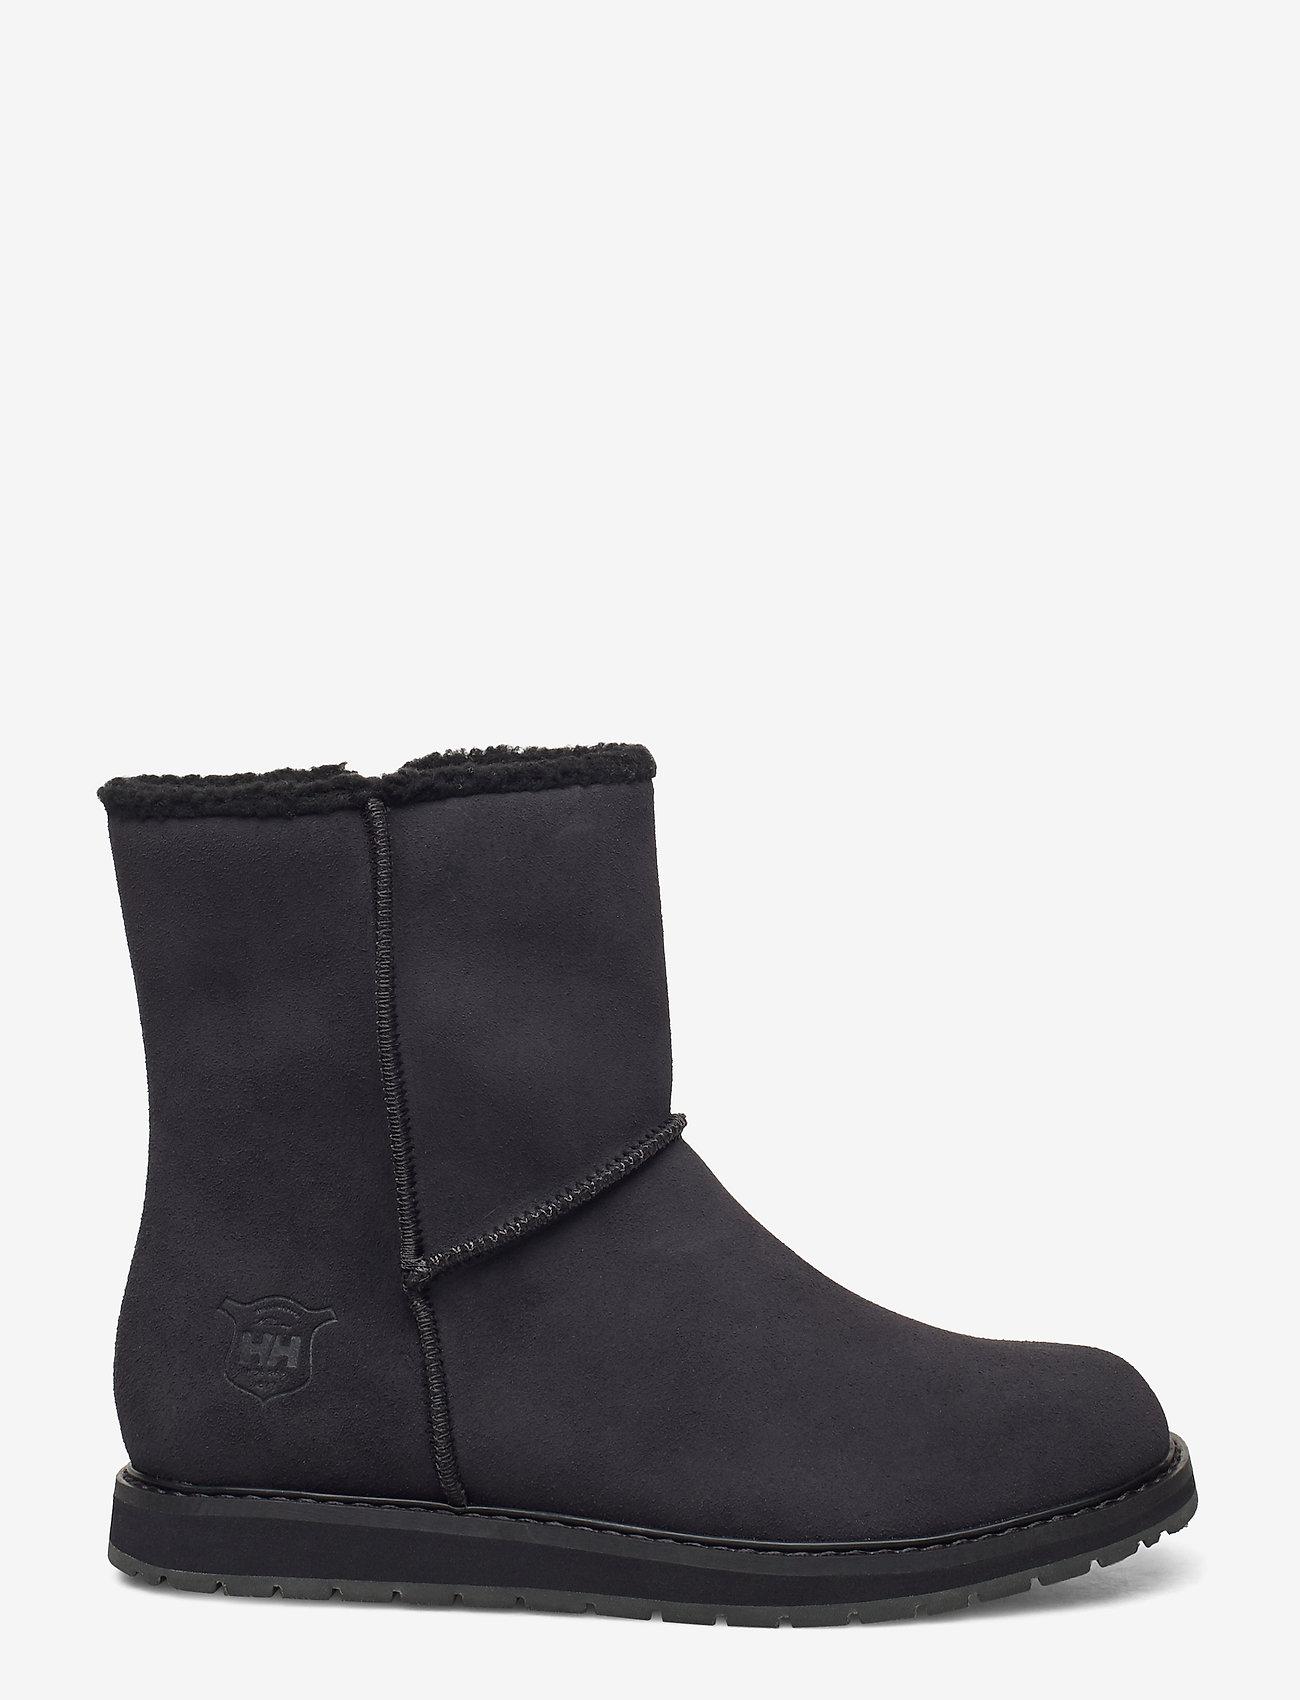 Helly Hansen - W ANNABELLE BOOT - flat ankle boots - 990 black / black gum - 1